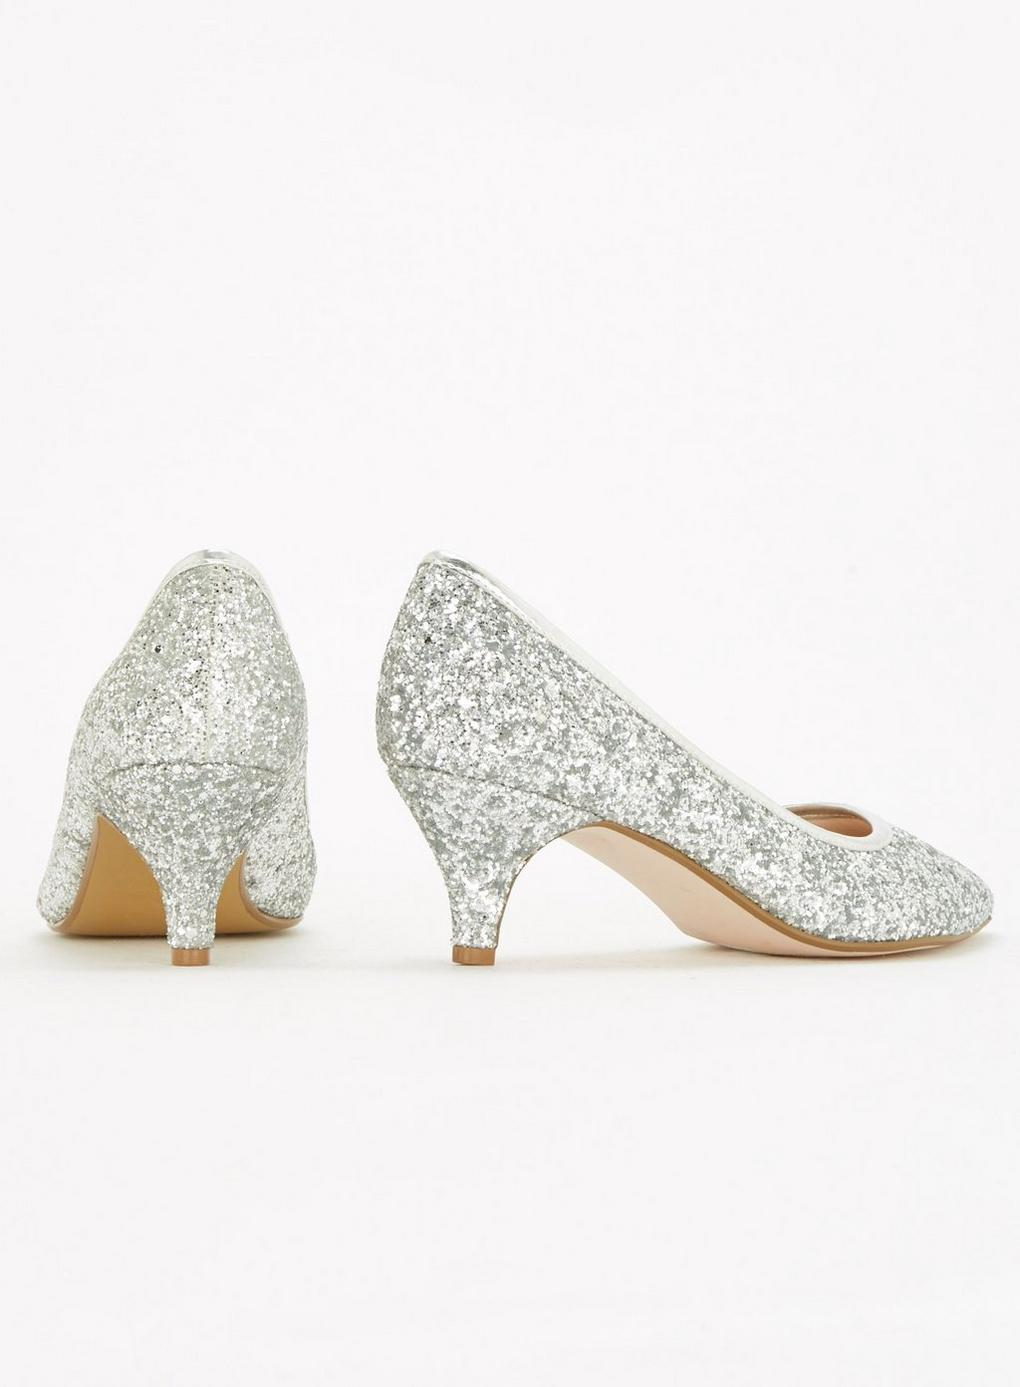 354750e3b5ba3 Evans Extra Wide Fit Silver Glitter Kitten Heel Court Shoes in ...